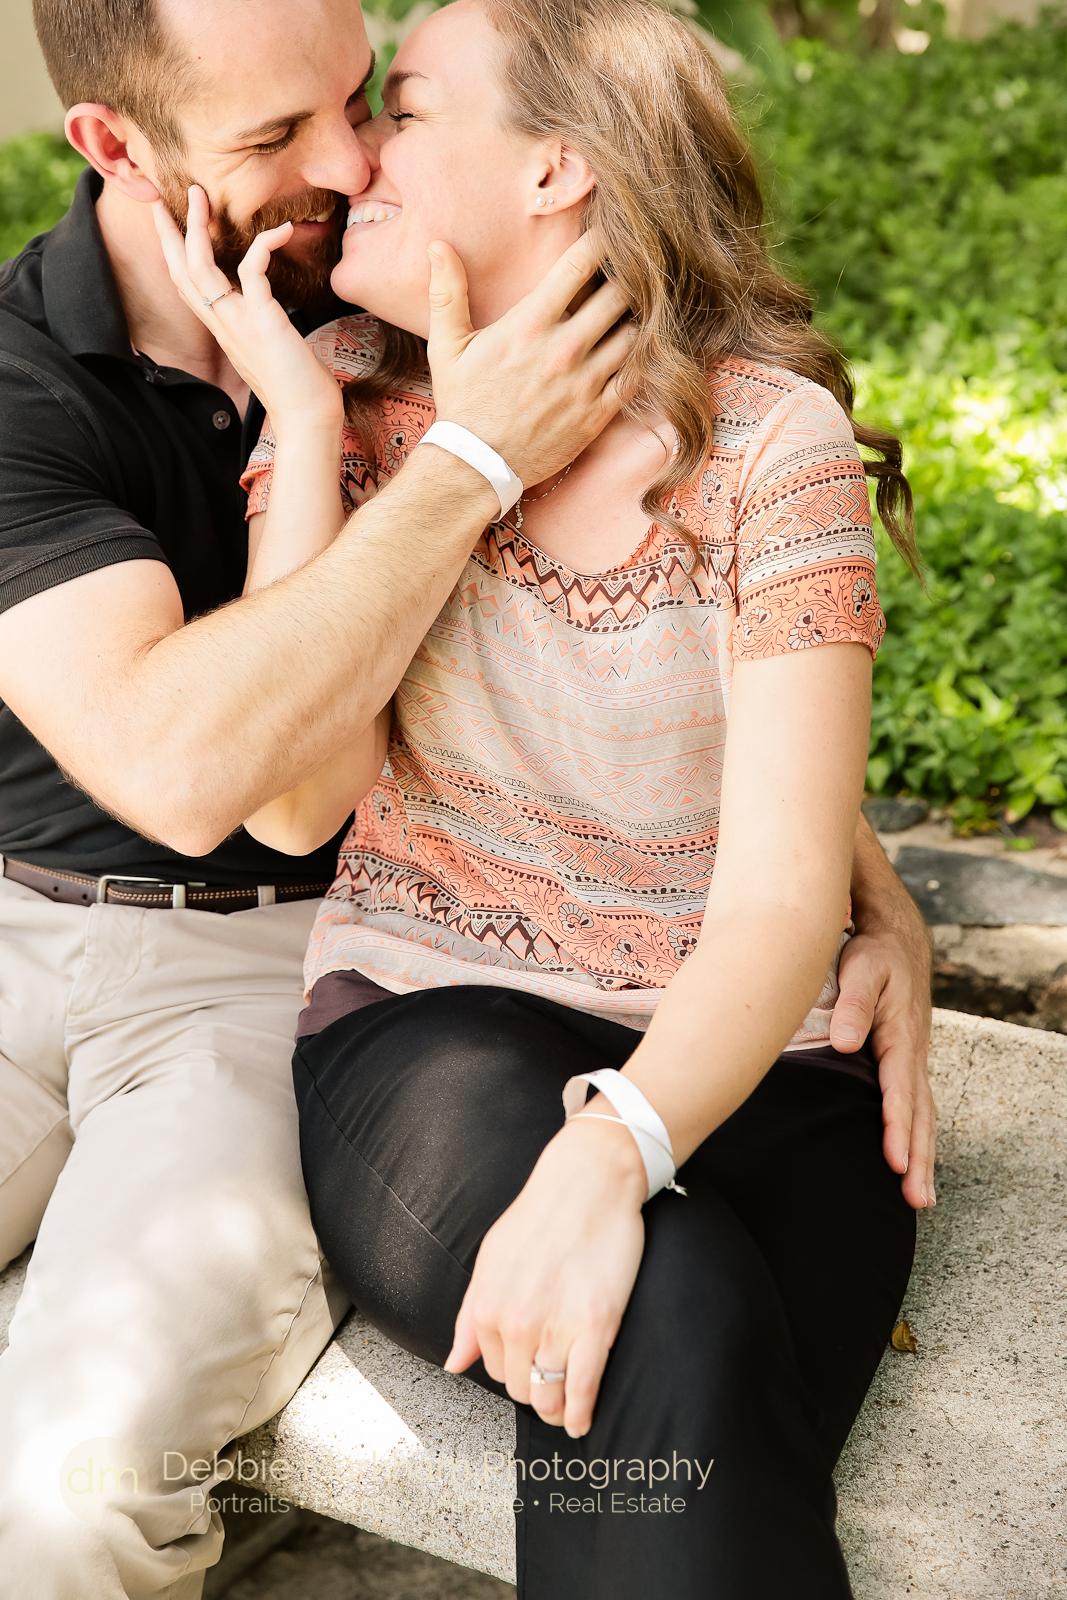 4-29-15 Surprise Proposal at Hearst Castle-5359